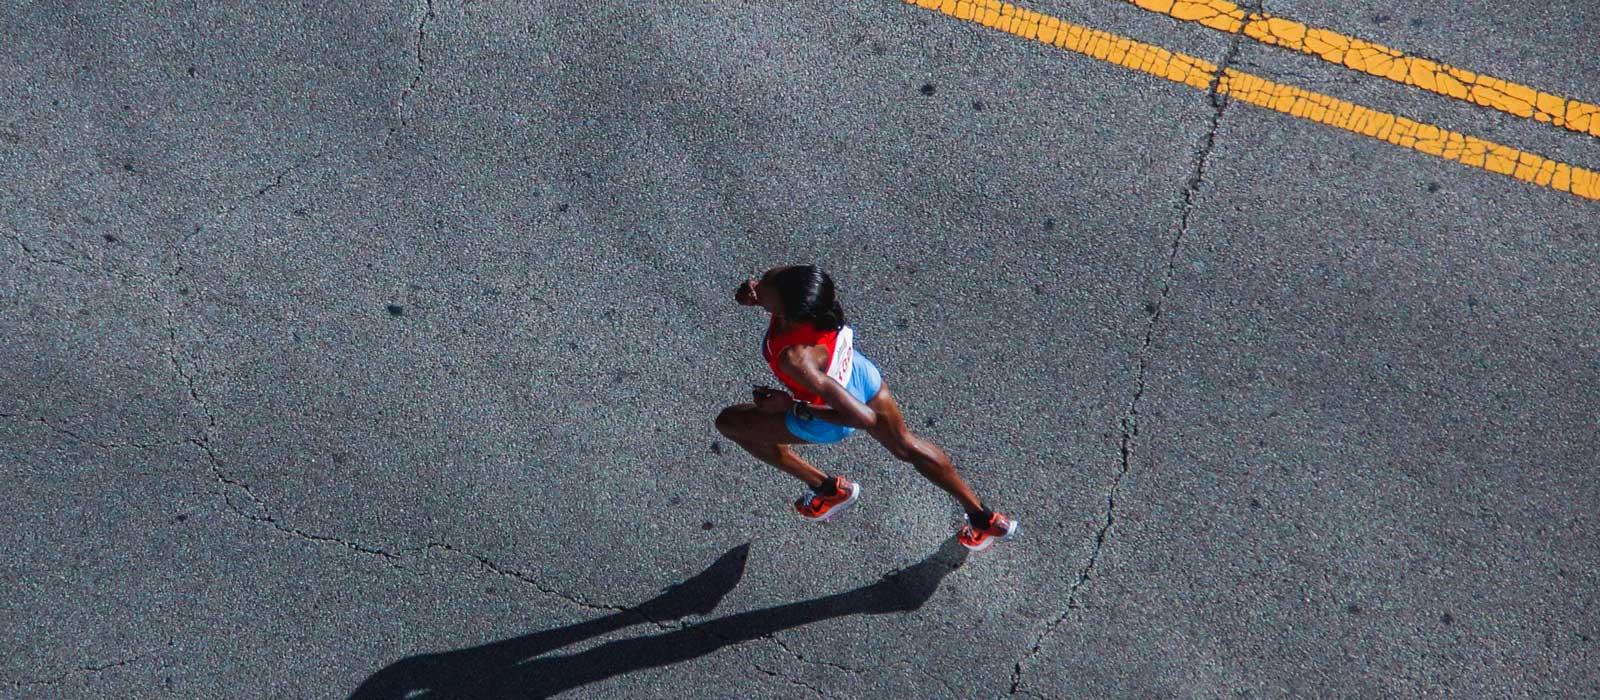 Sport Vision, vizuelni identitet akcije